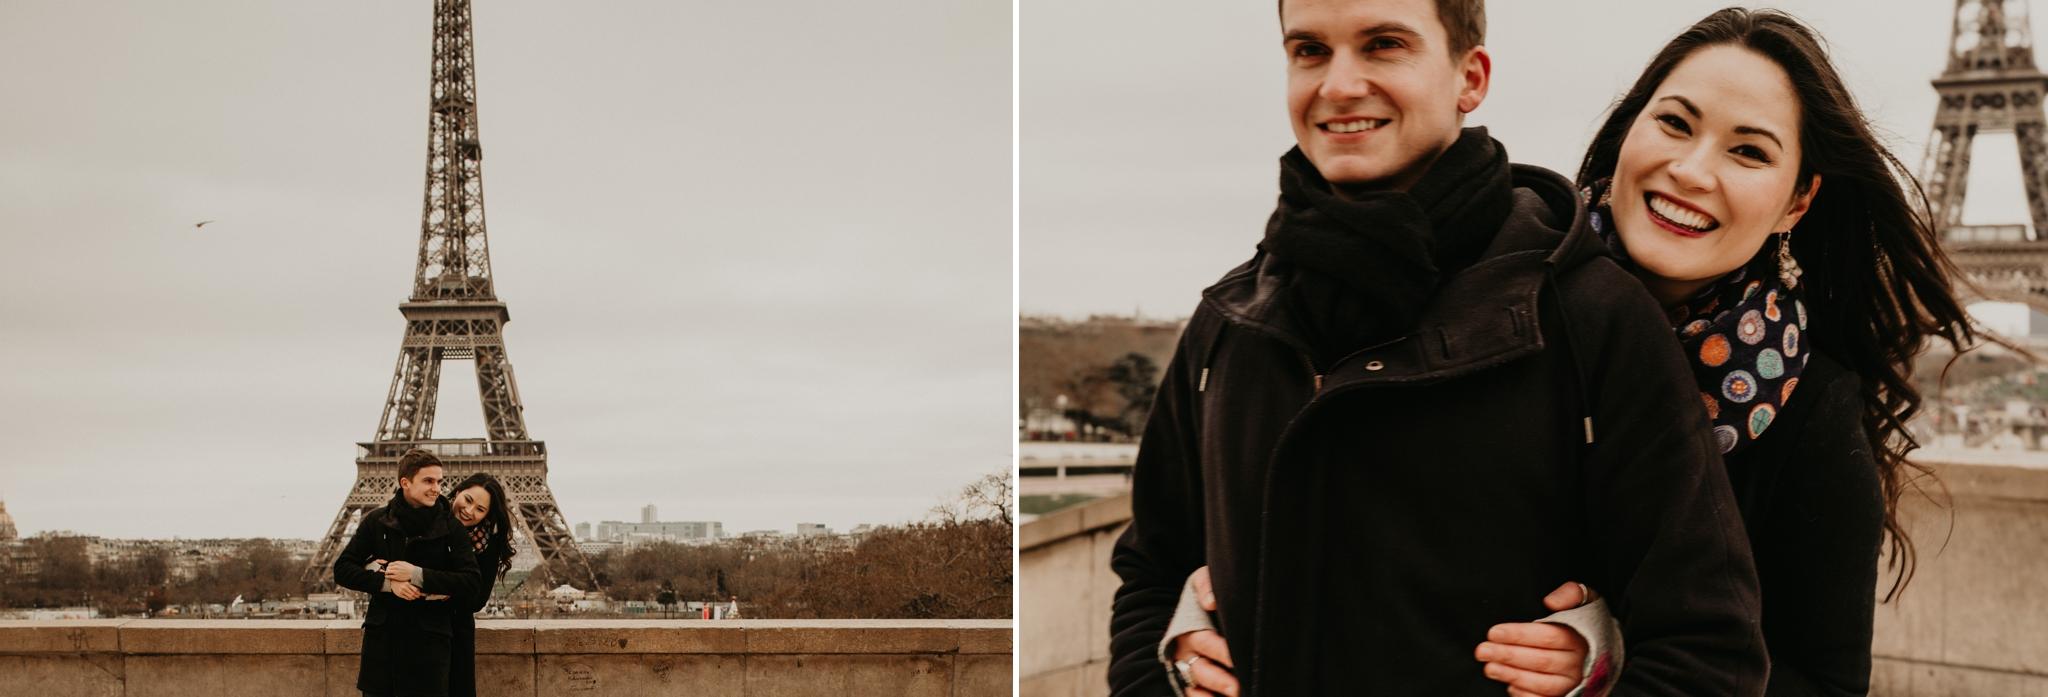 paris-engagement-photographer.jpg